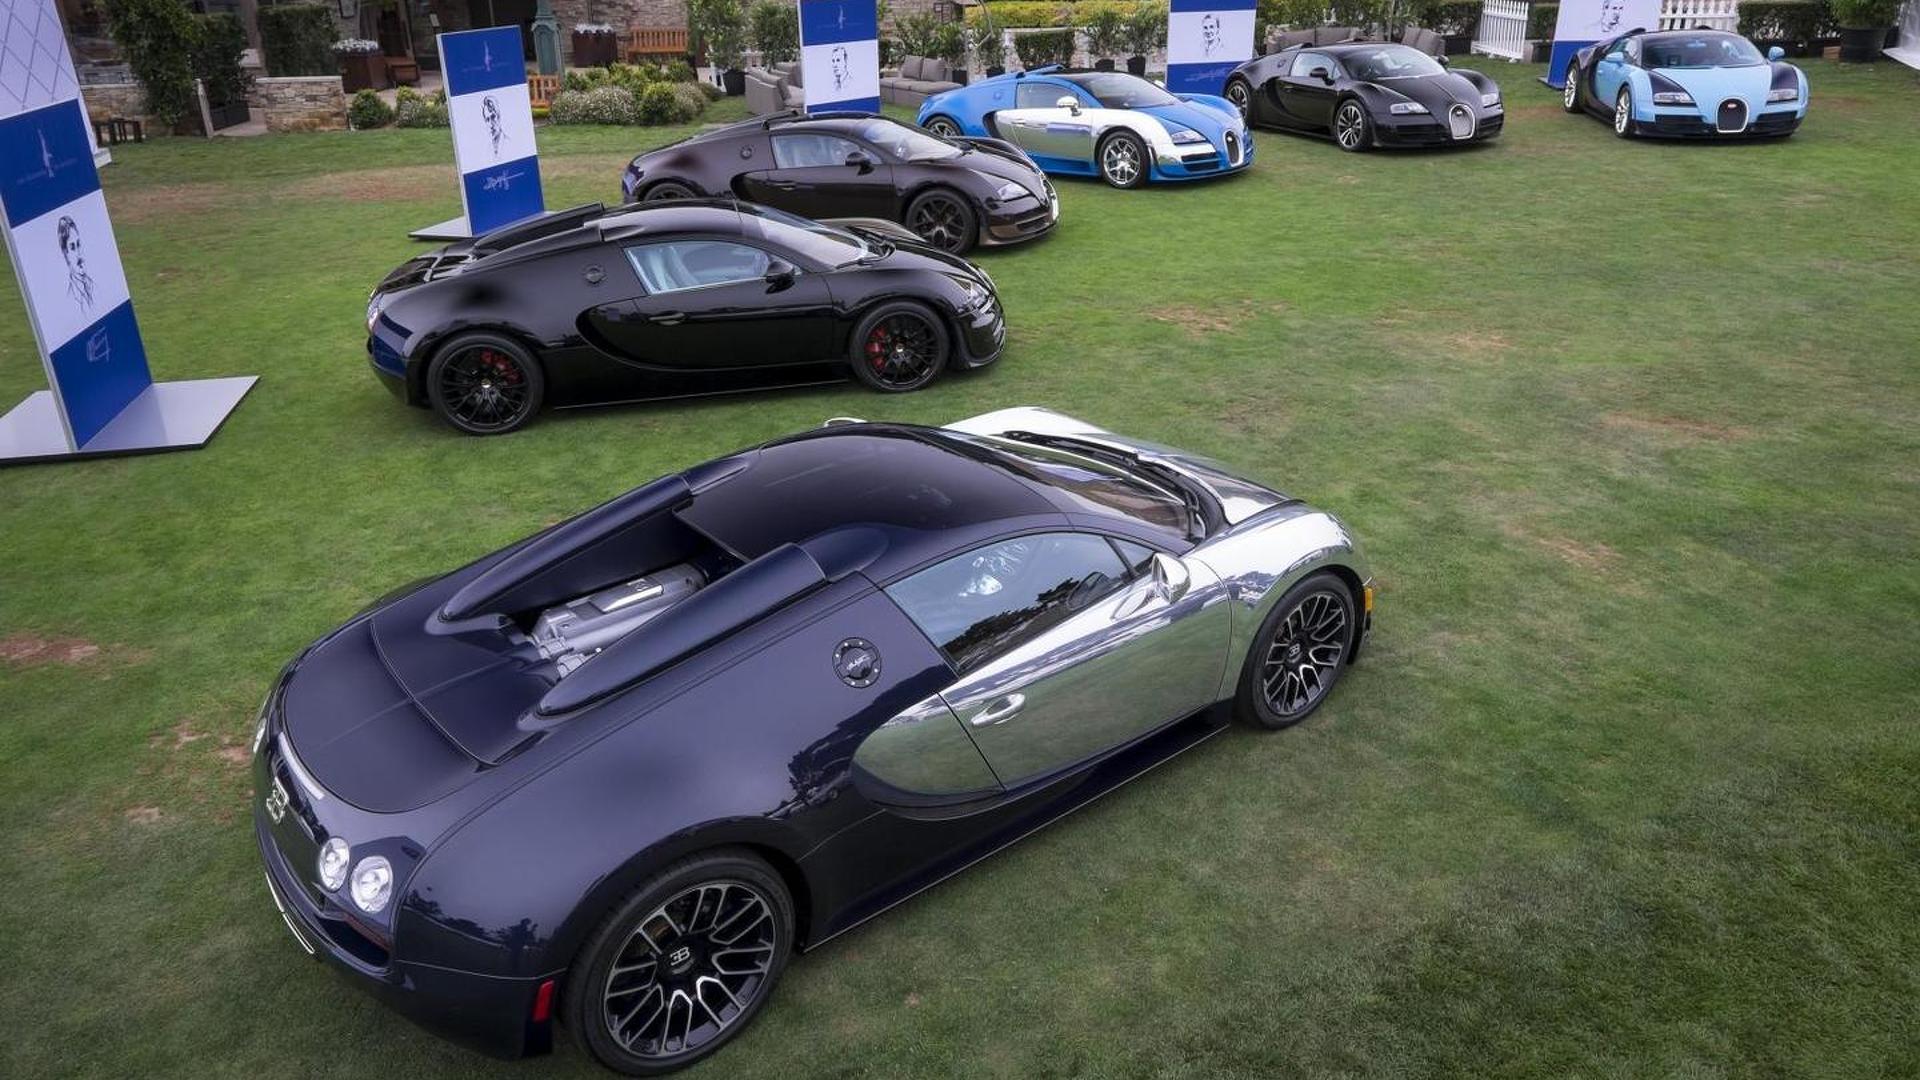 2014-495220-bugatti-veyron-legends-editions1 Breathtaking Bugatti Veyron Black Bess Price Cars Trend